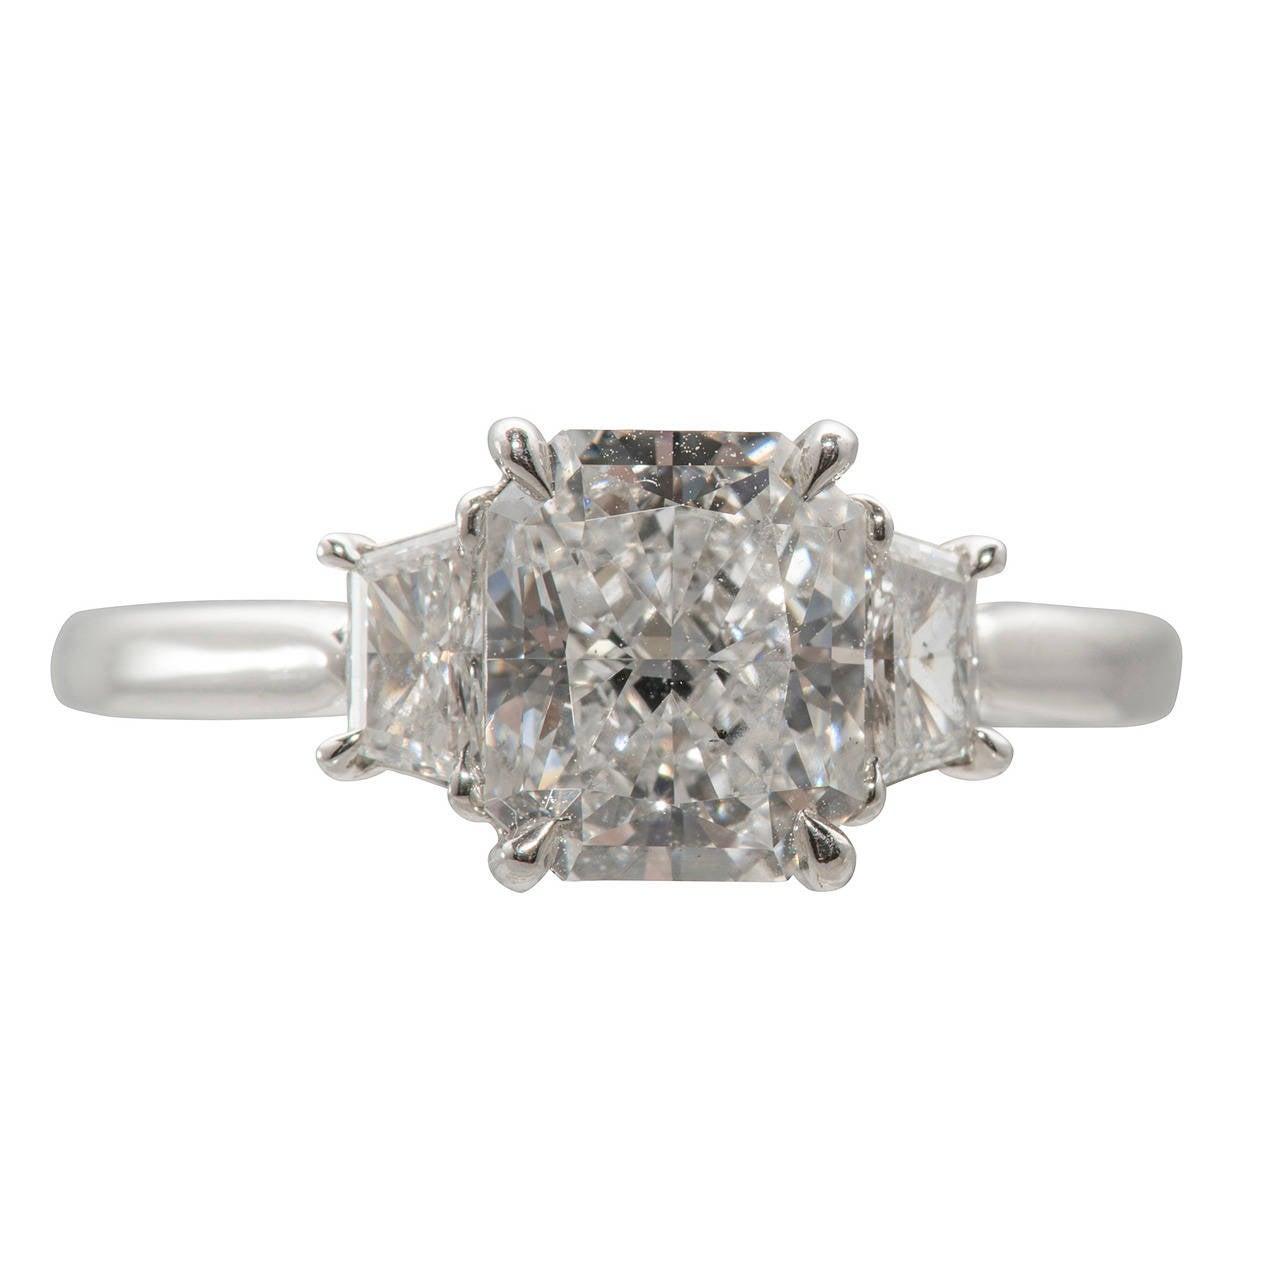 Kwiat Gia Cert 207 Carat Radiant Cut Diamond Engagement Ring 1